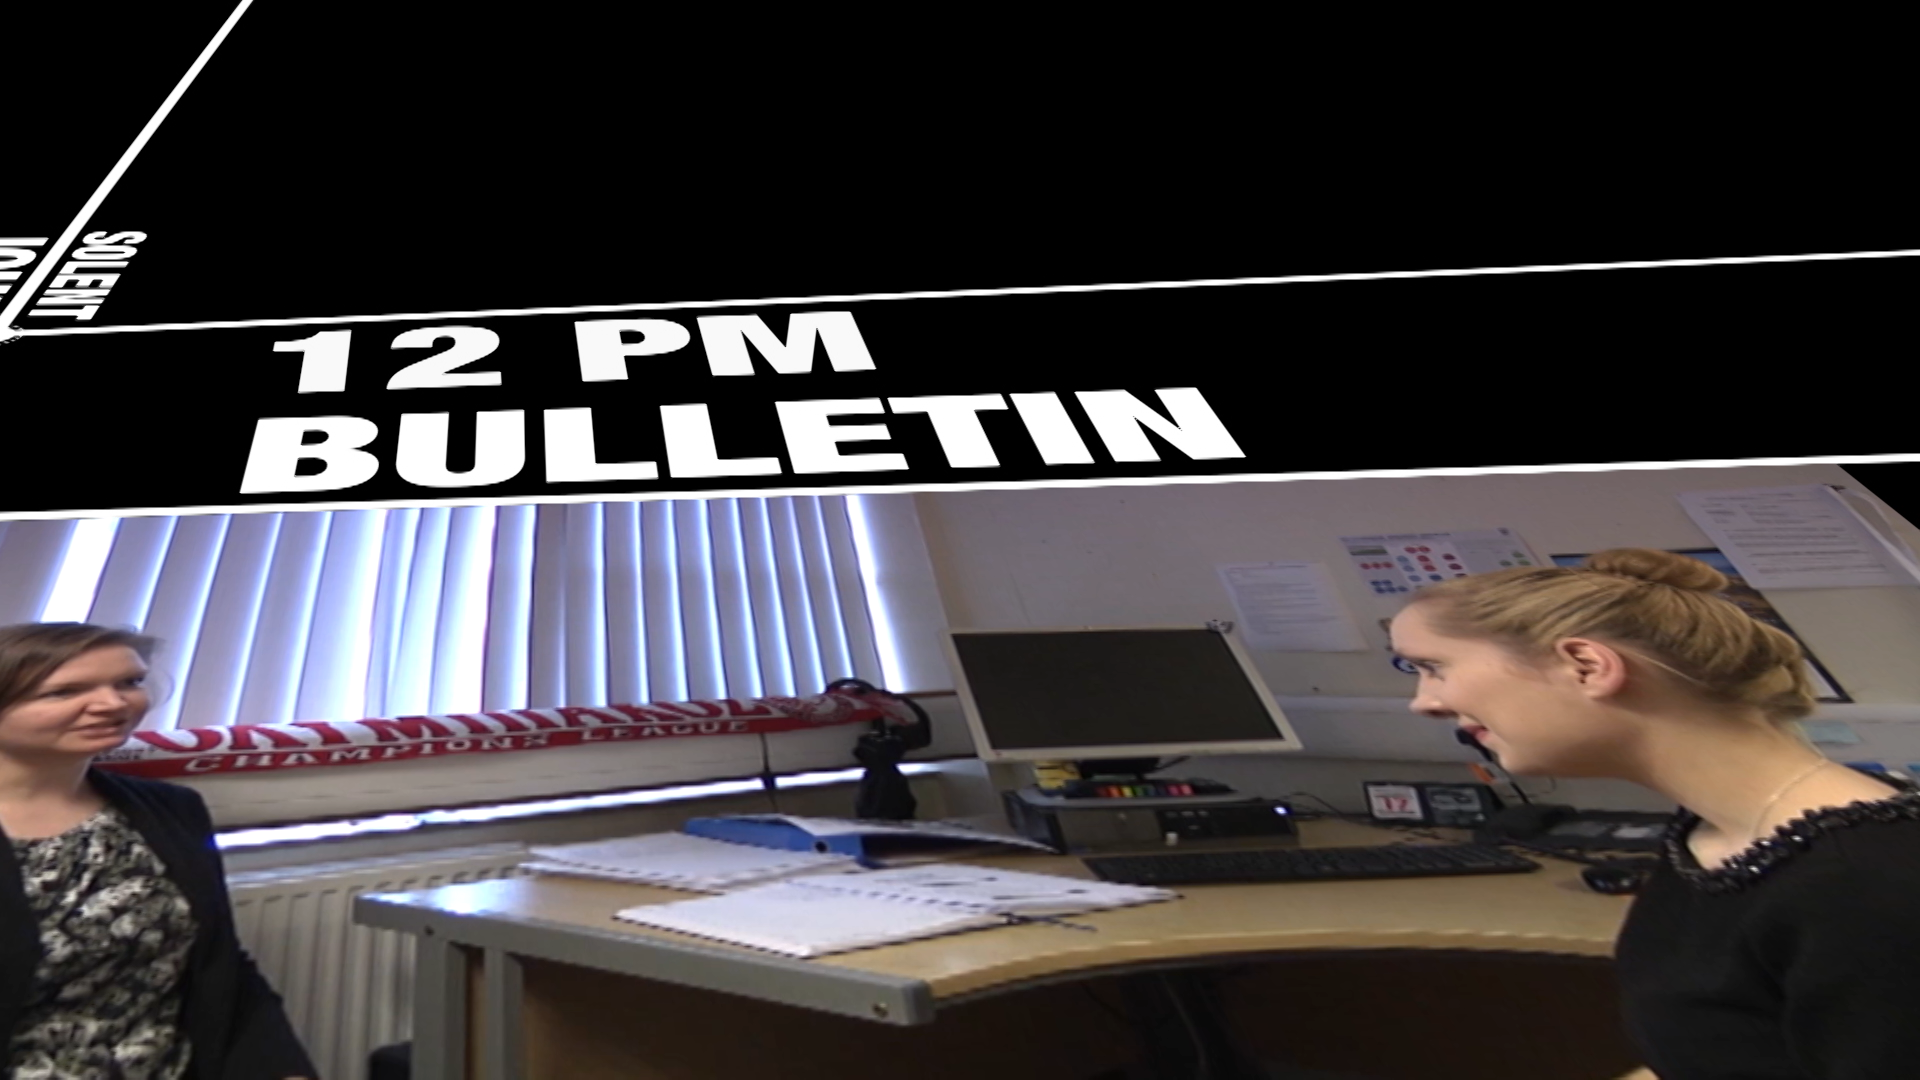 12PM TV Bulletin